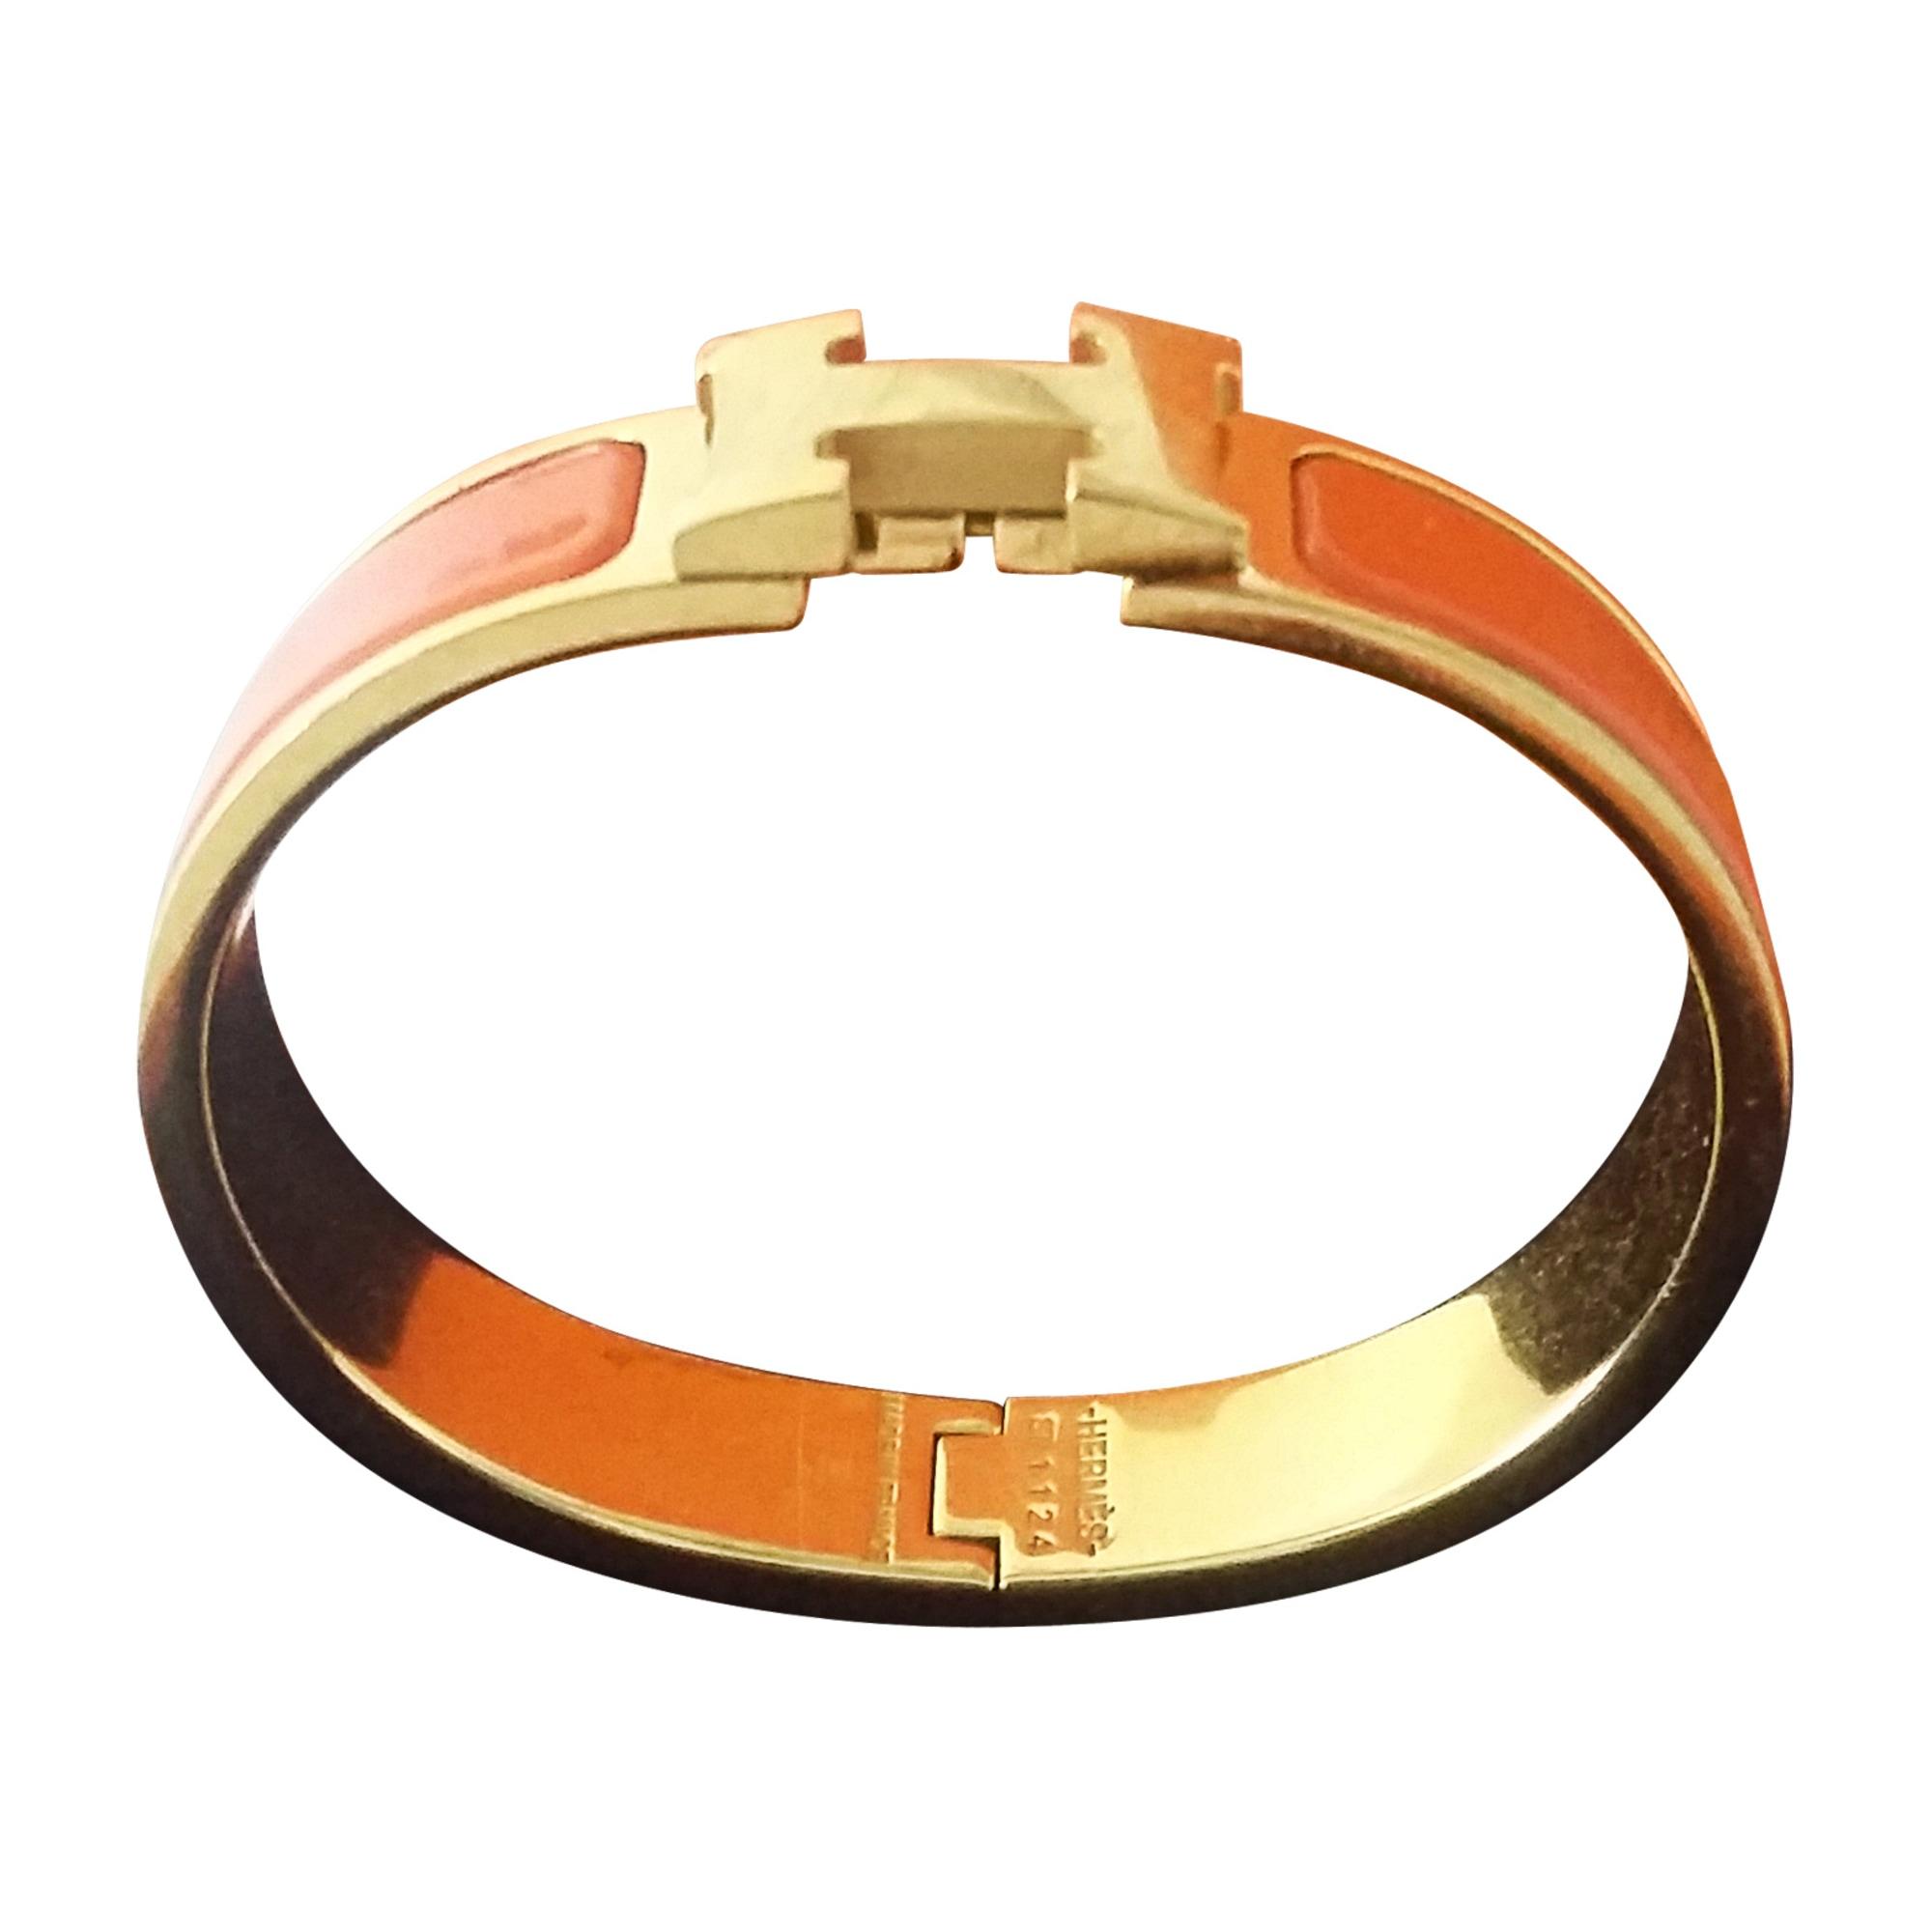 8267e06ca9e4 Bracelet HERMÈS clic h orange vendu par Vis - 7644290